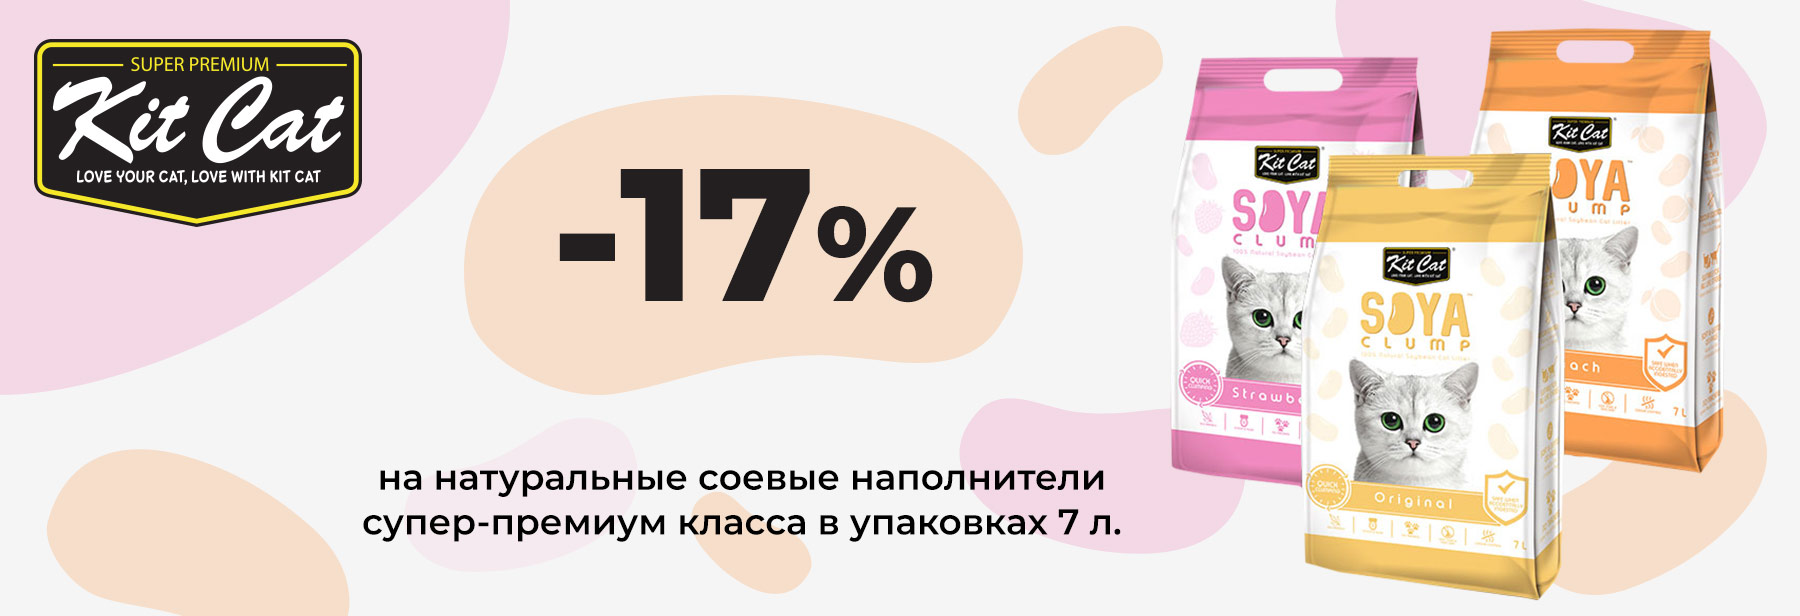 Скидка 17% на наполнители Kit Cat Соя в весовке 2,5 кг